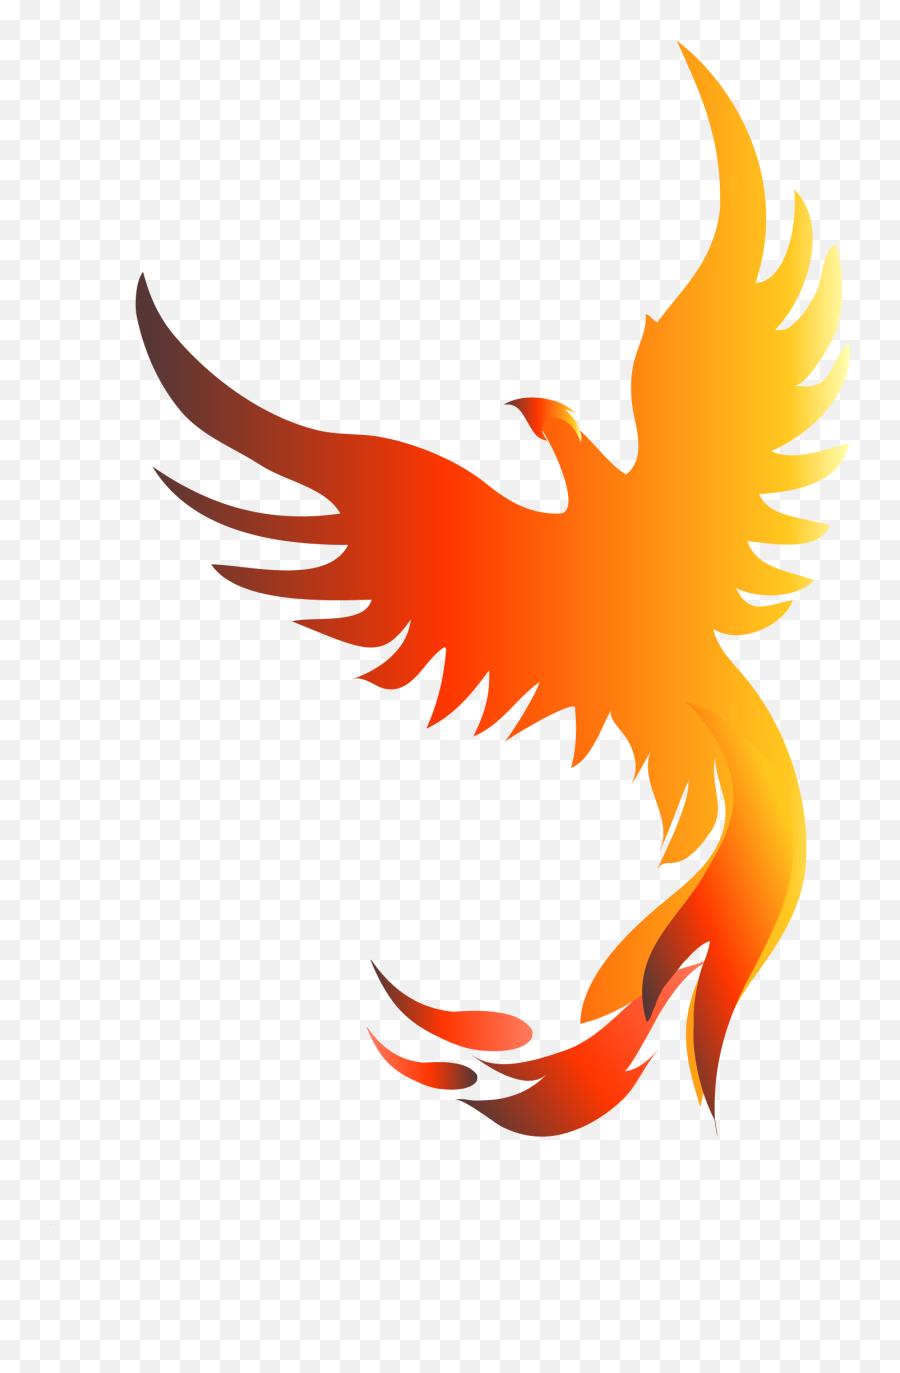 Phoenix Clipart Pheonix Phoenix Pheonix Transparent Free - Phoenix Logo Png Emoji